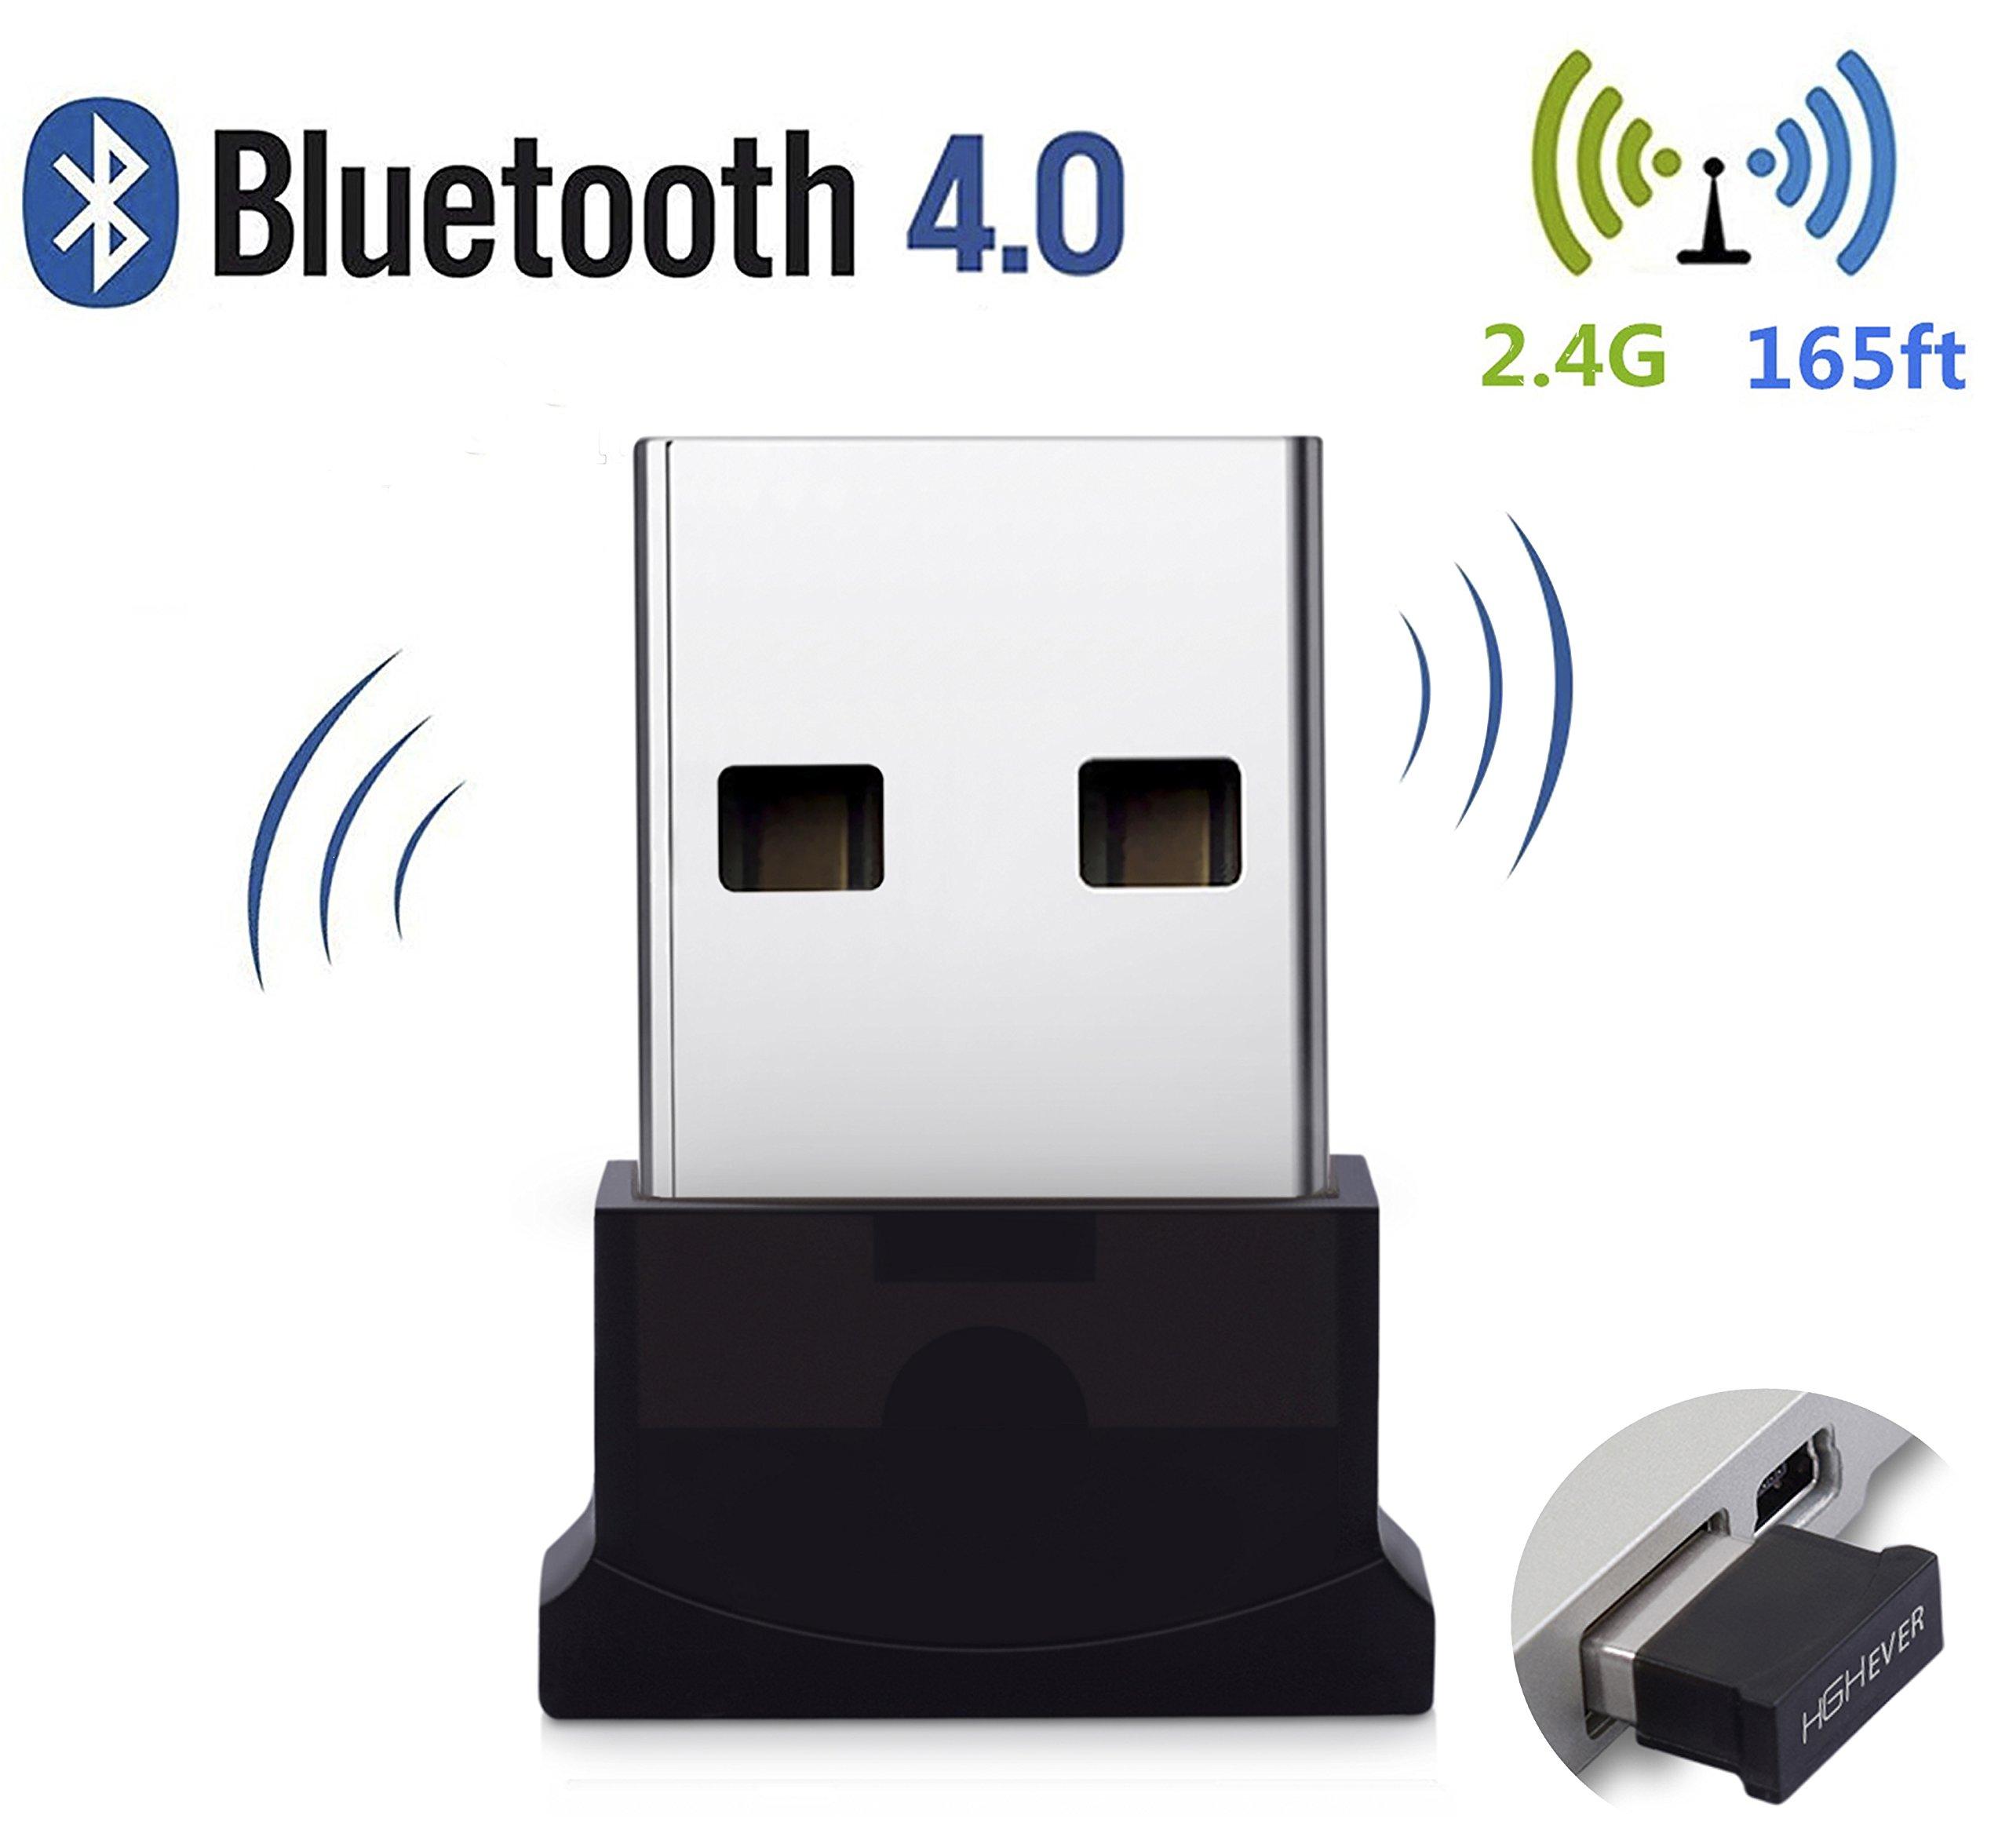 Bluetooth USB Adapter, 4.0 Bluetooth Low Energy 2.4Ghz Range Wireless USB Dongle Adapter for PC, Windows 10/8.1/8/7, Vista/XP